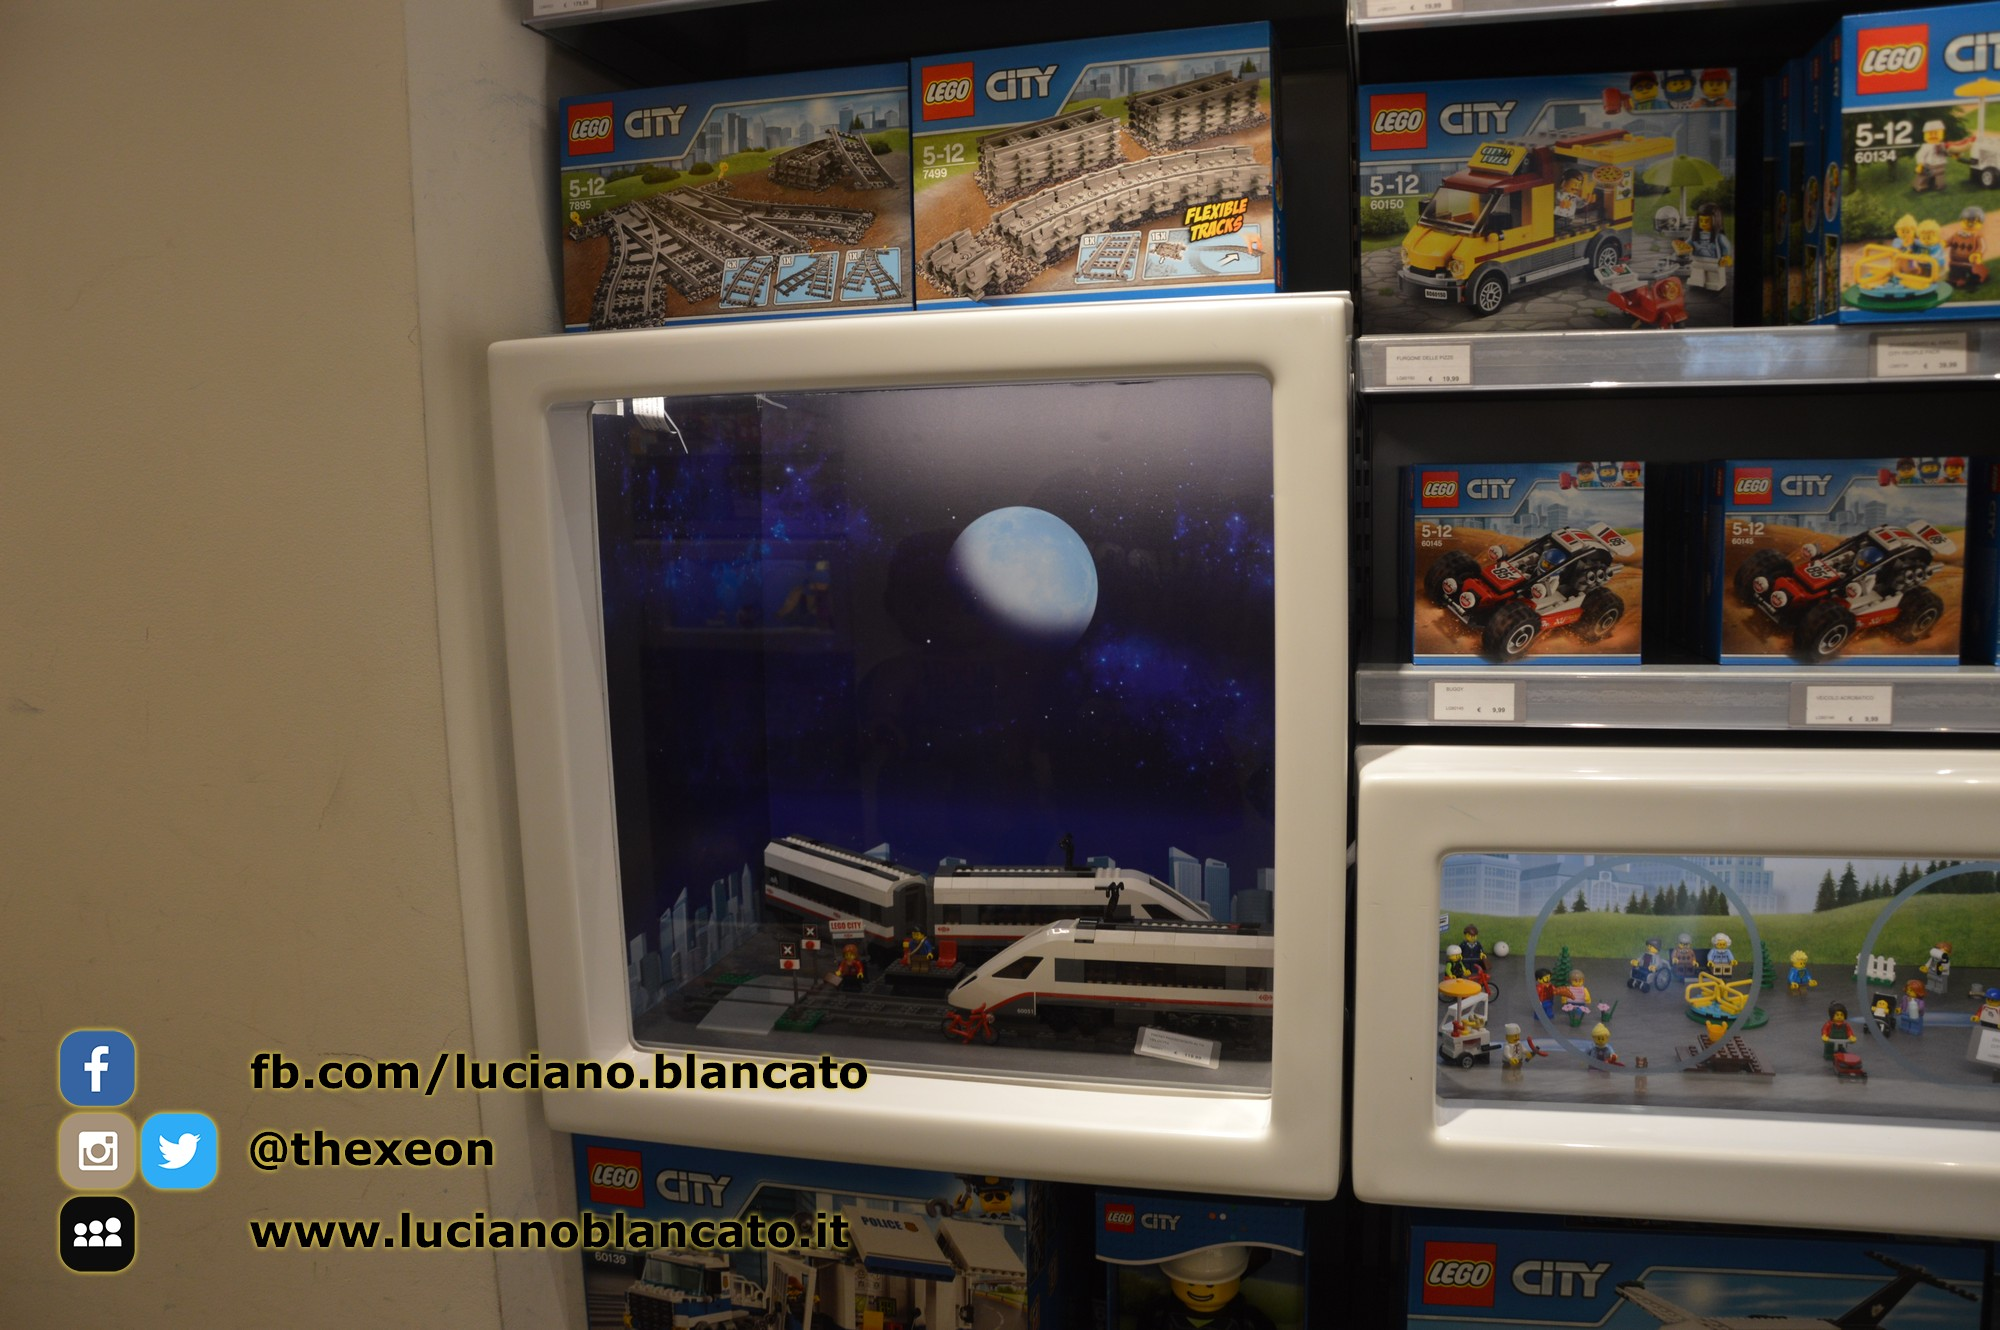 Milano - Lego Store - serie CITY